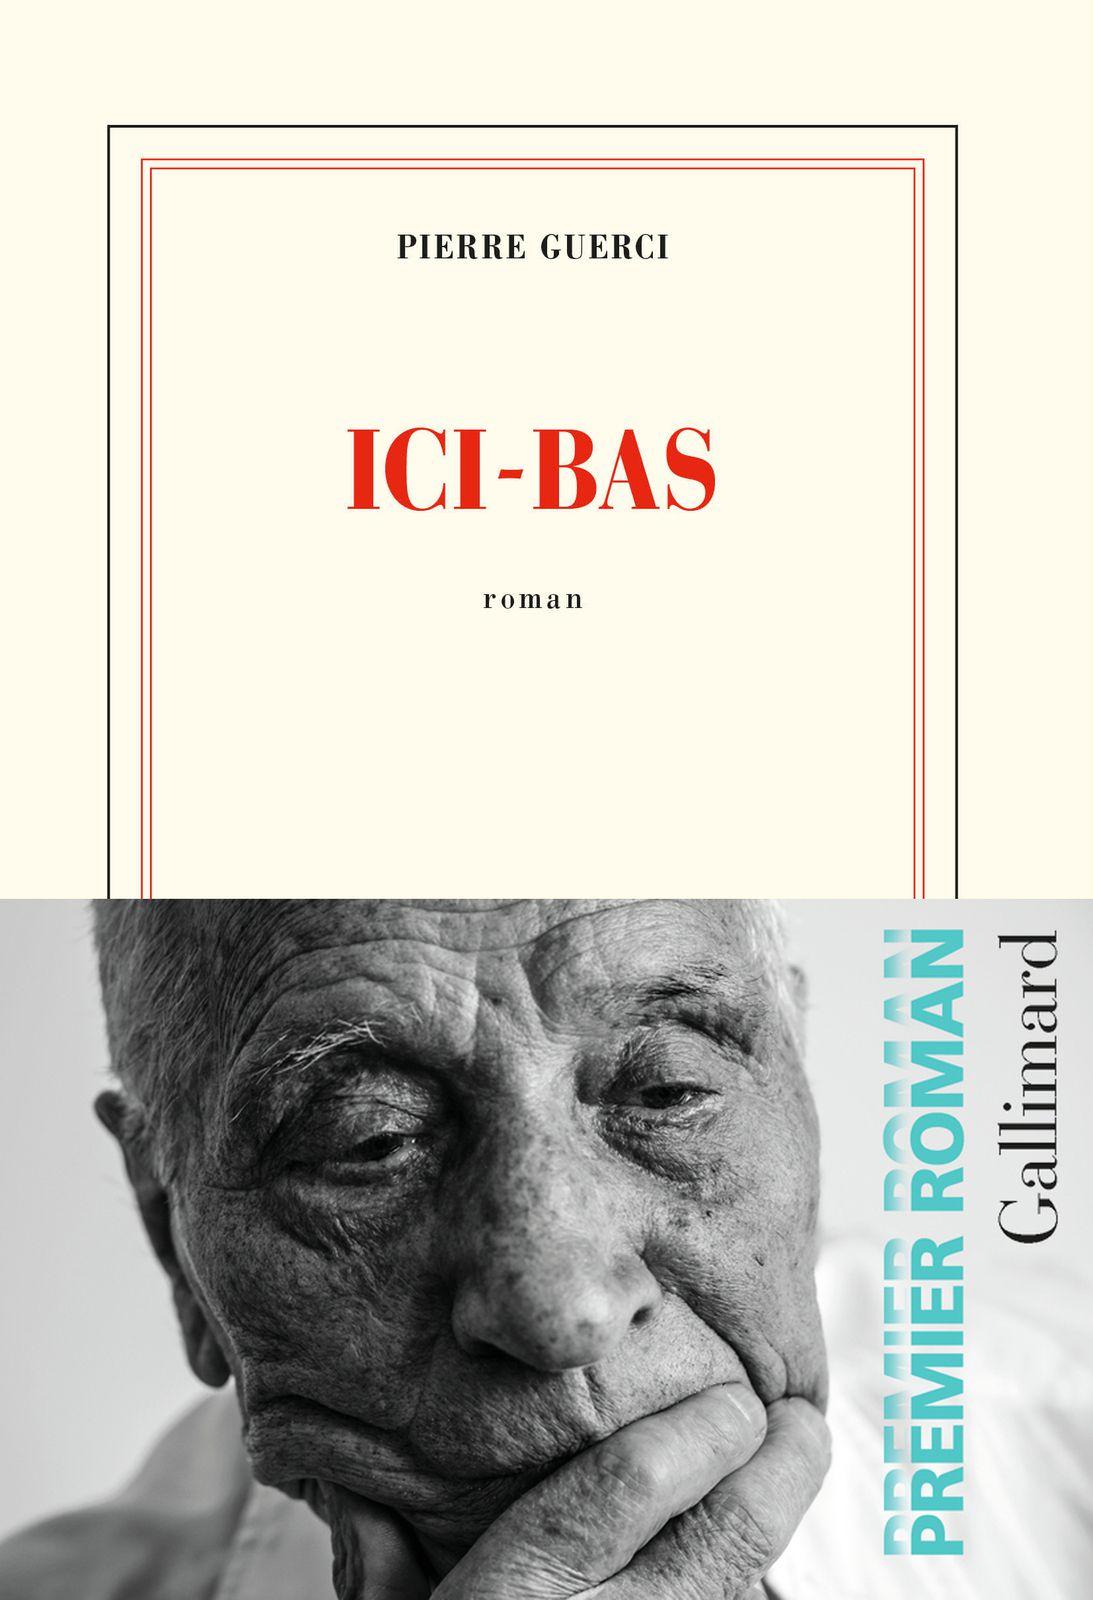 Ici Bas (Pierre Guerci, 2021, Ed Gallimard)